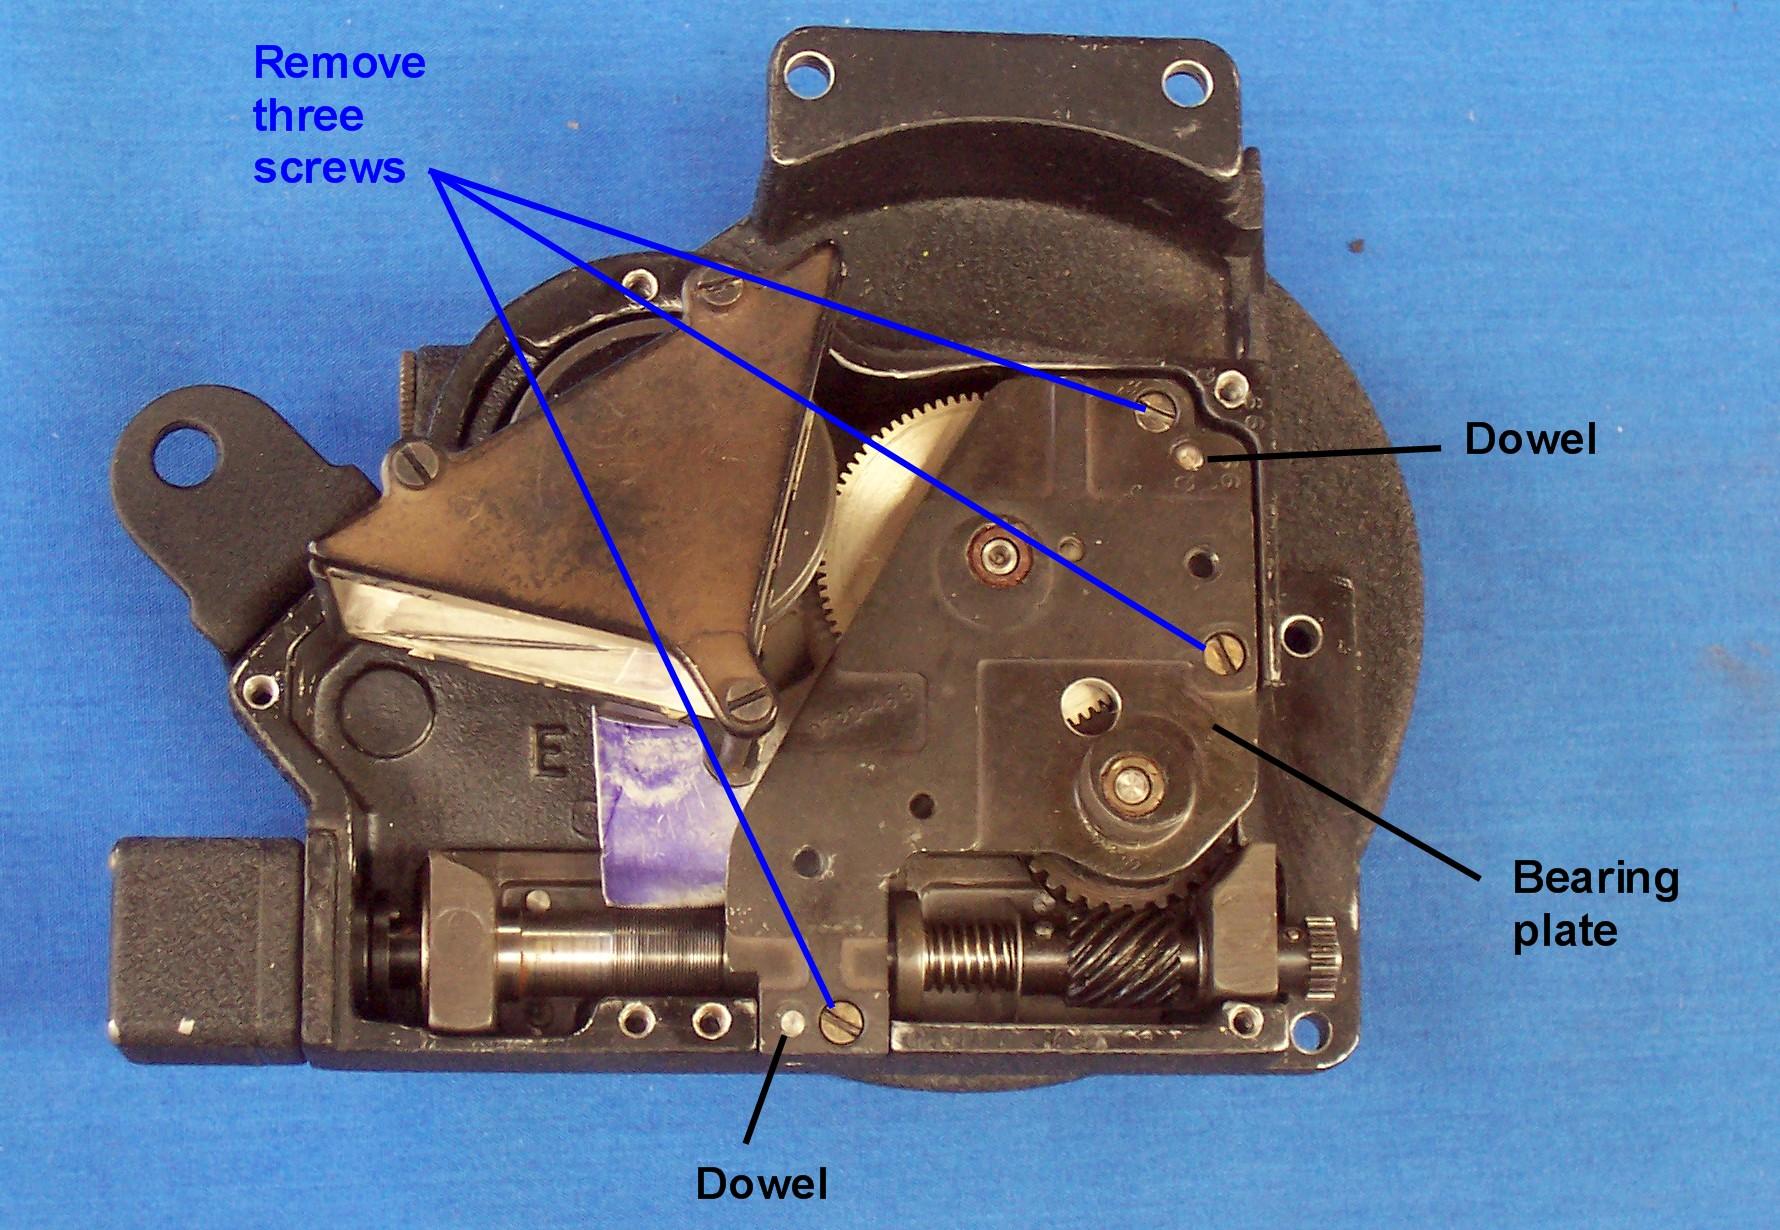 rem-bearing-plate